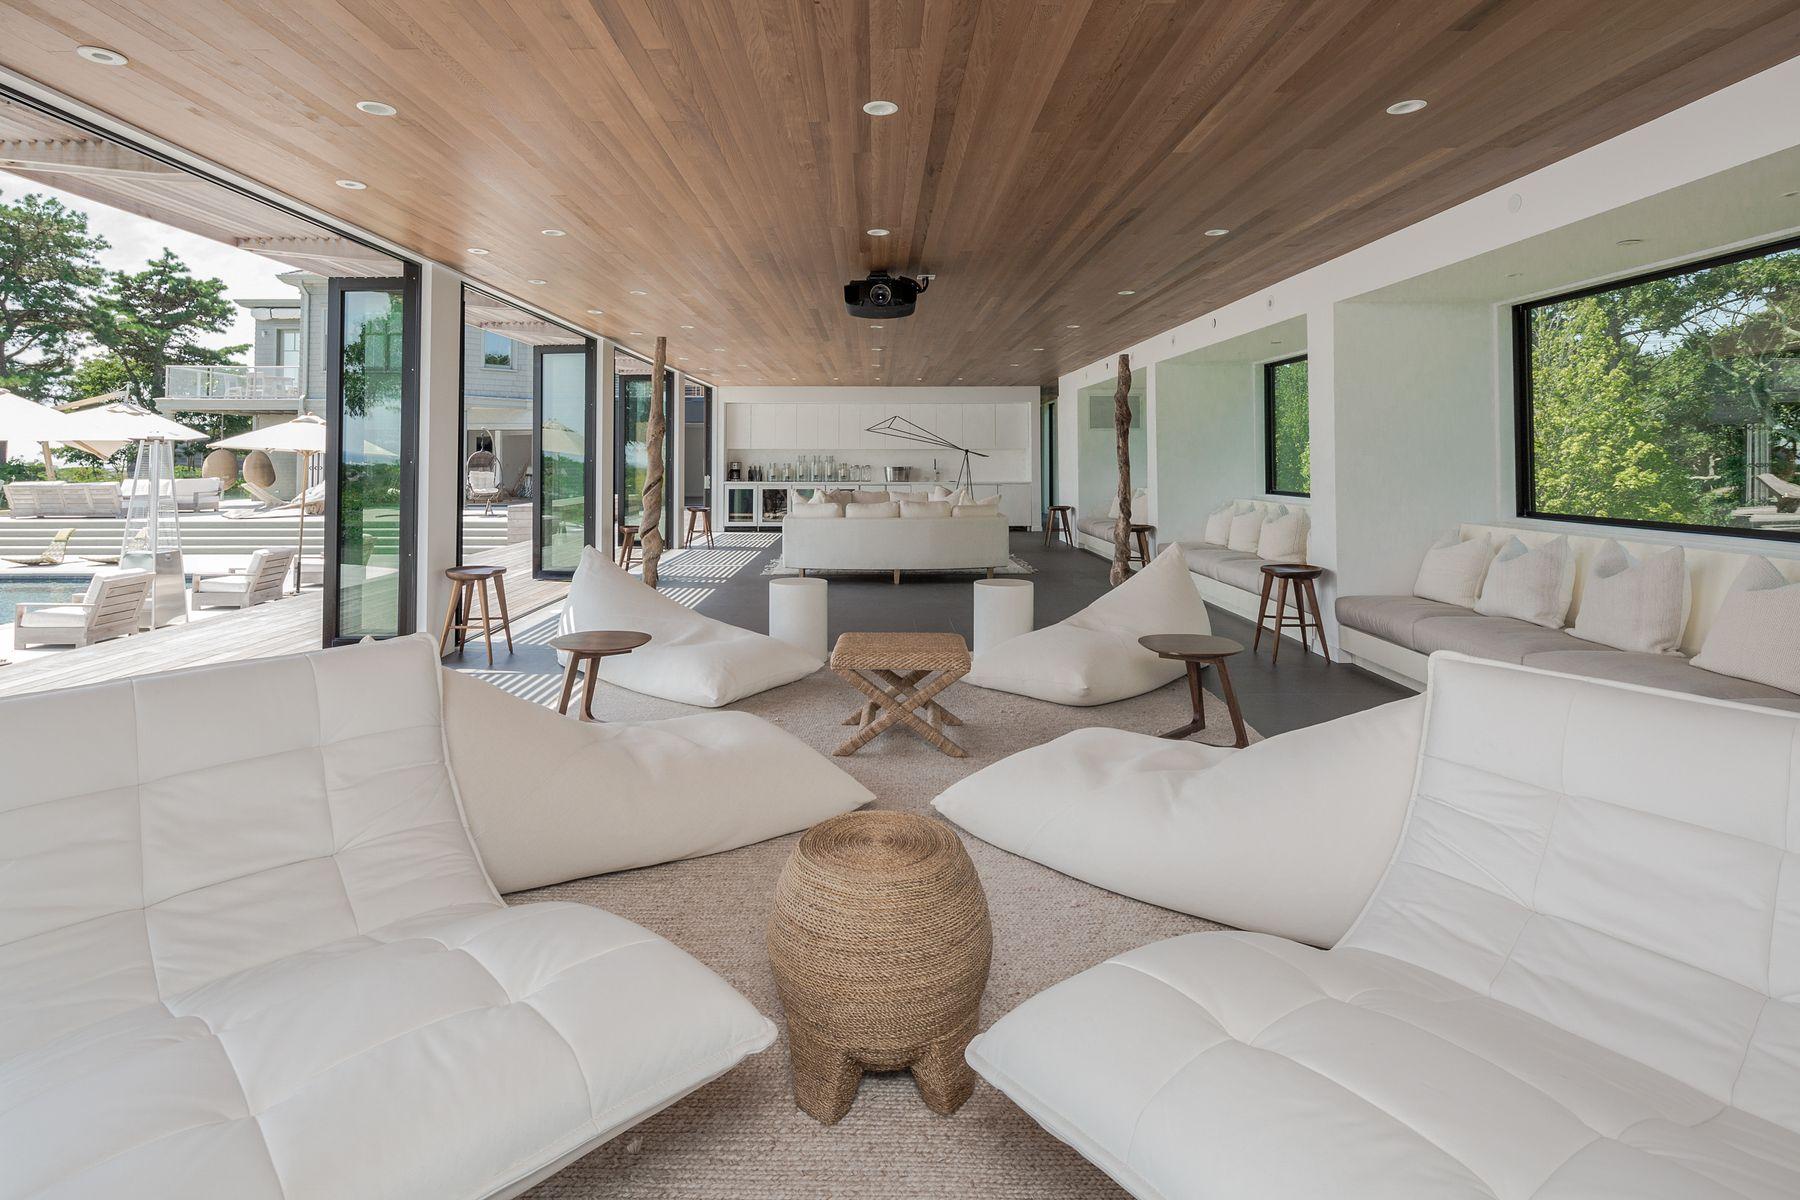 res4-resolution-4-architecture-modern-modular-house-prefab-amagansett-addition-interior-living-lounge.jpg